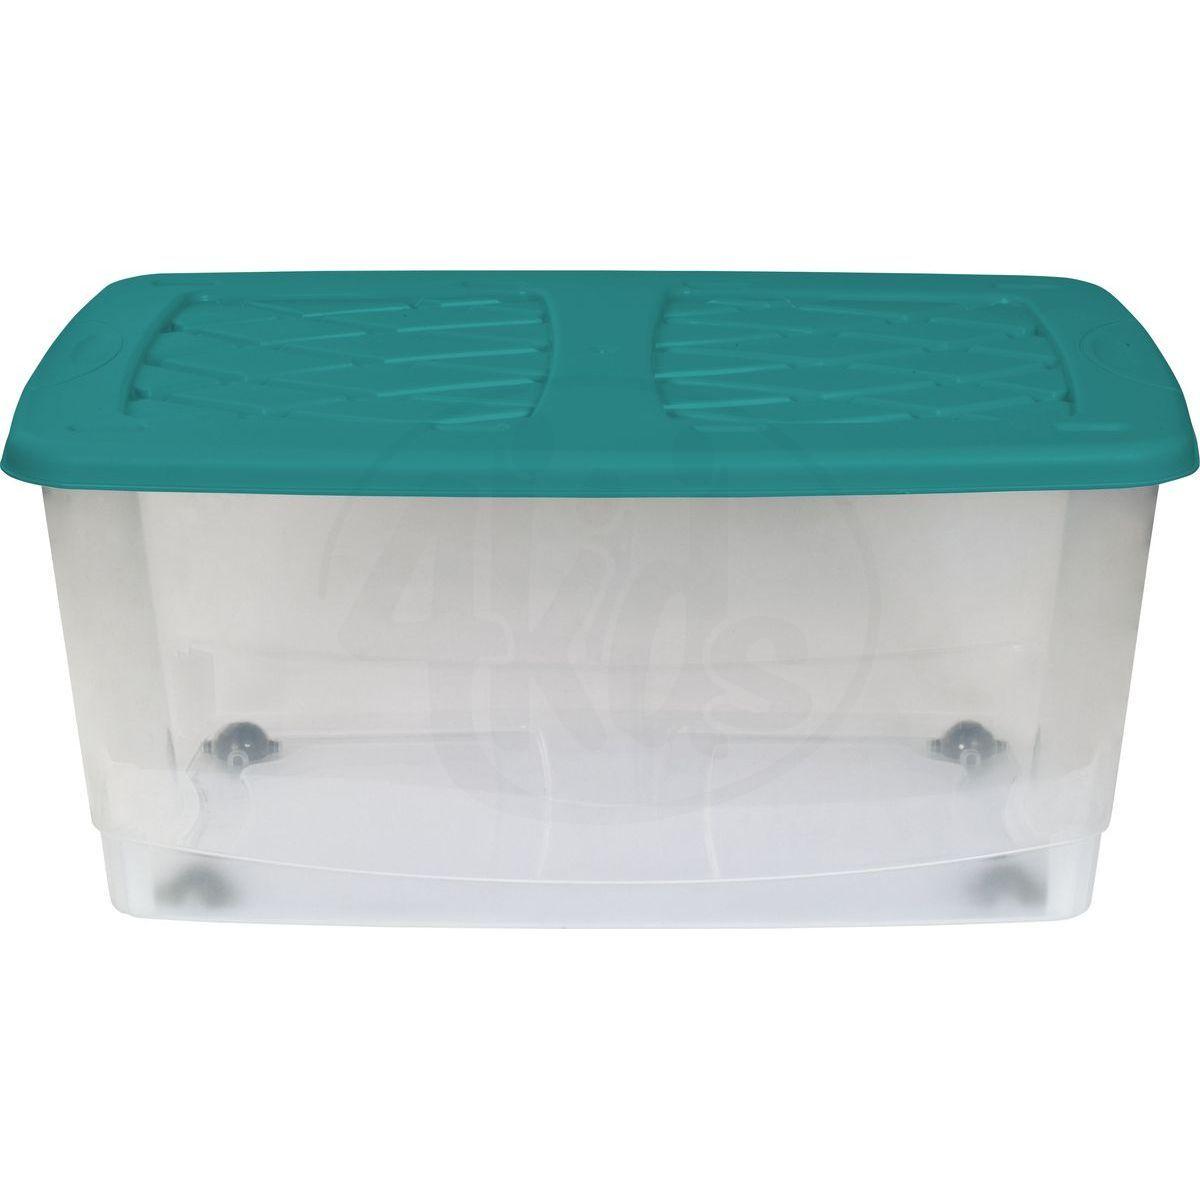 Marianplast Dětský kontejner na hračky Zelené víko